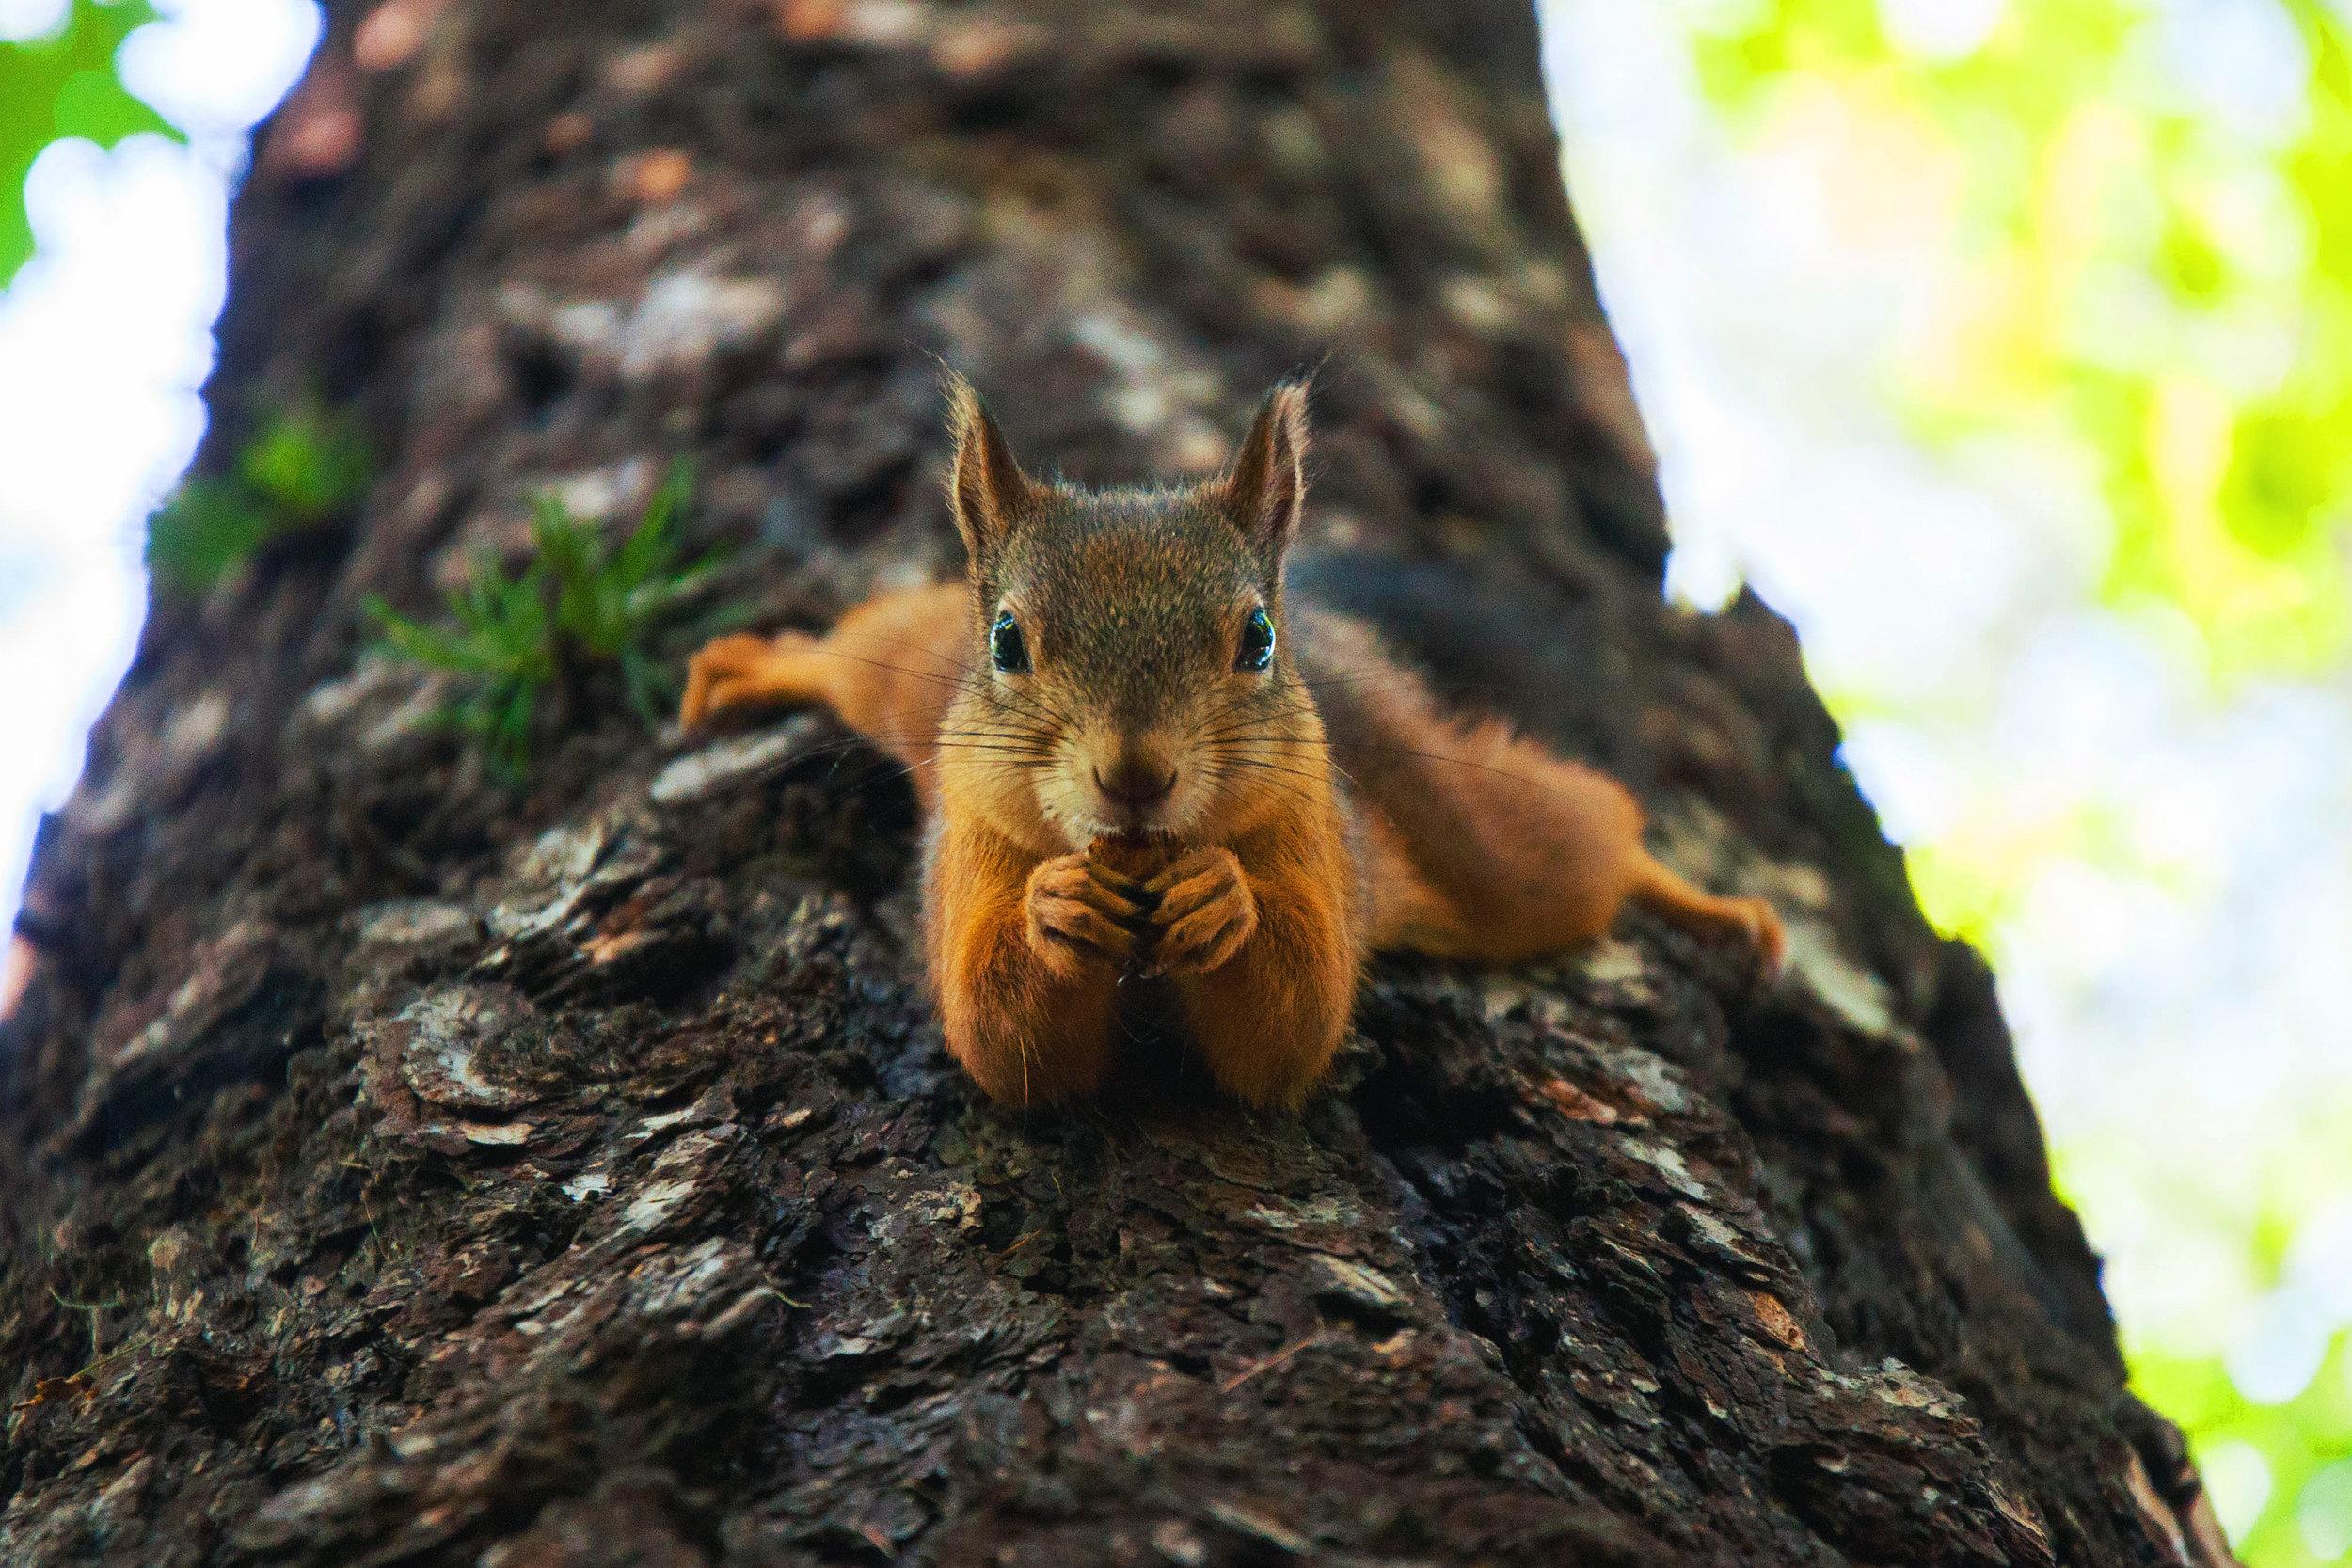 Squirrel on Tree Image.jpeg